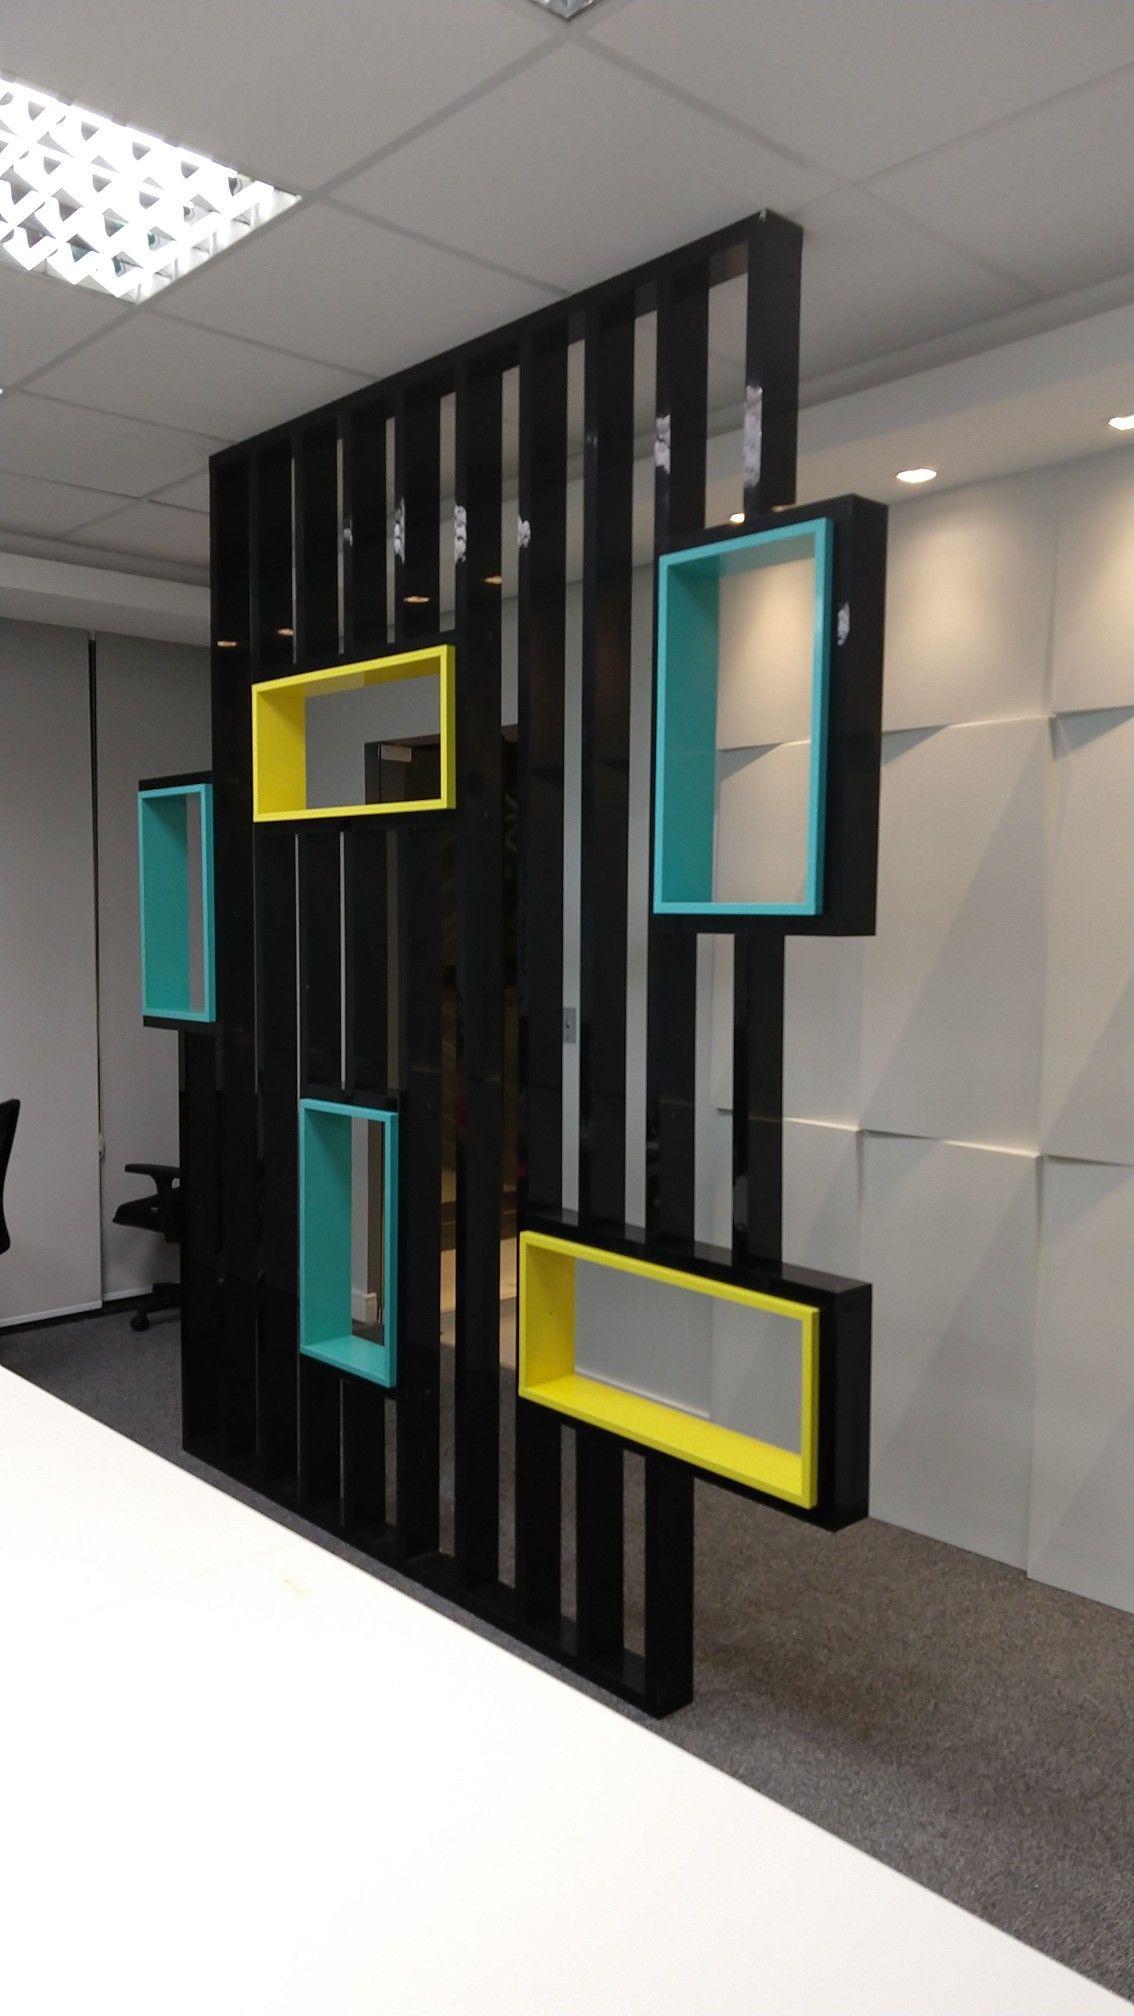 Divisoria agencia seven also best interior furniture decorating ideas decor units rh pinterest